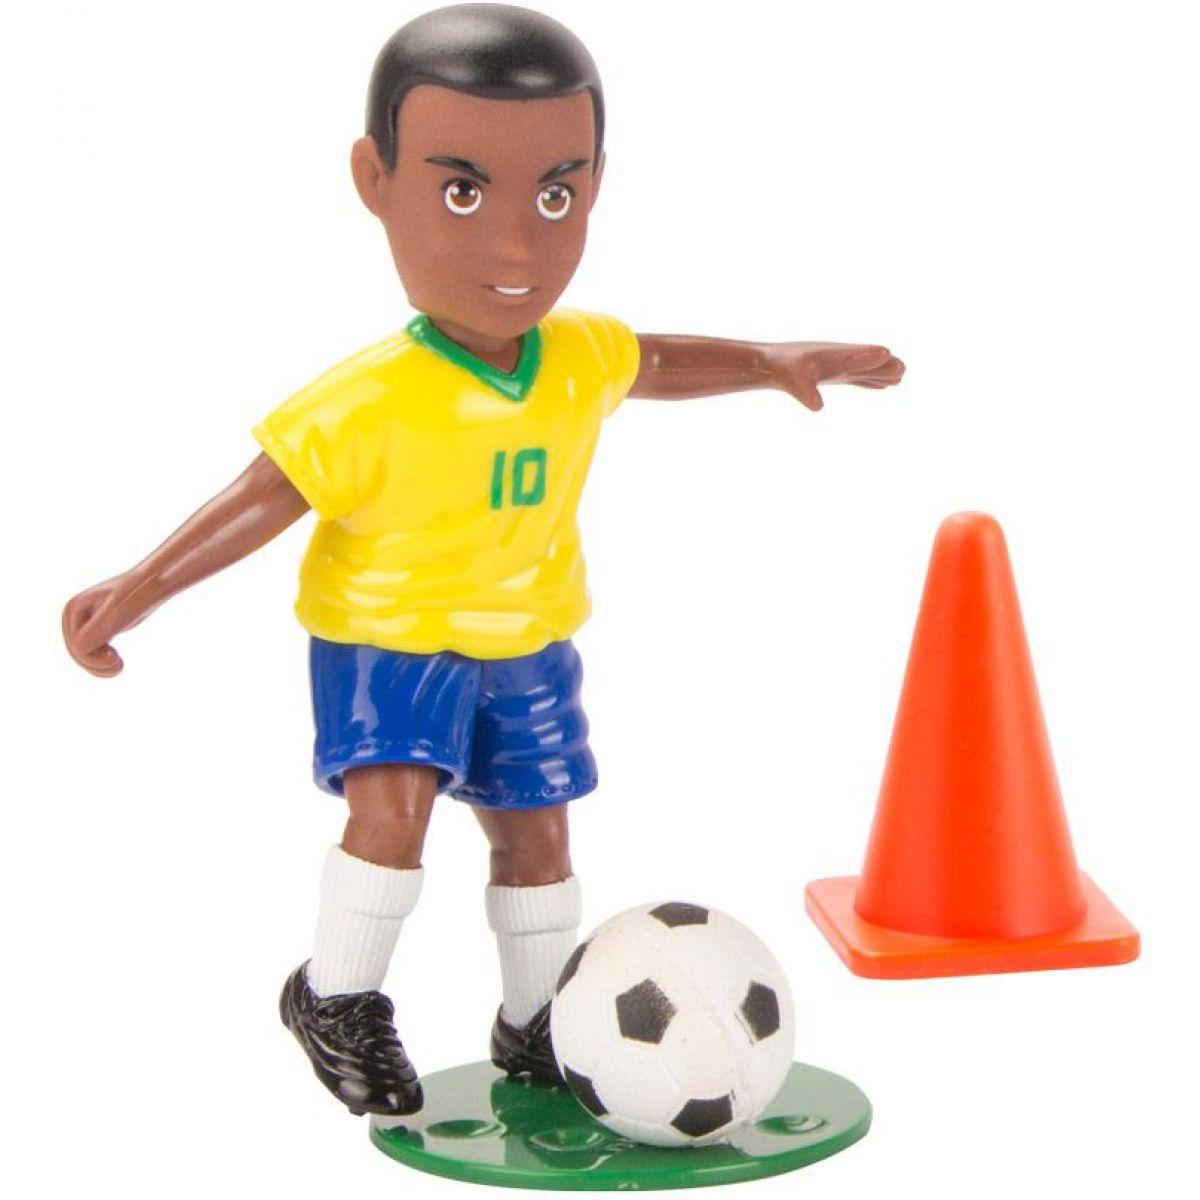 EPline Shooters figurka Brazílie č. 10